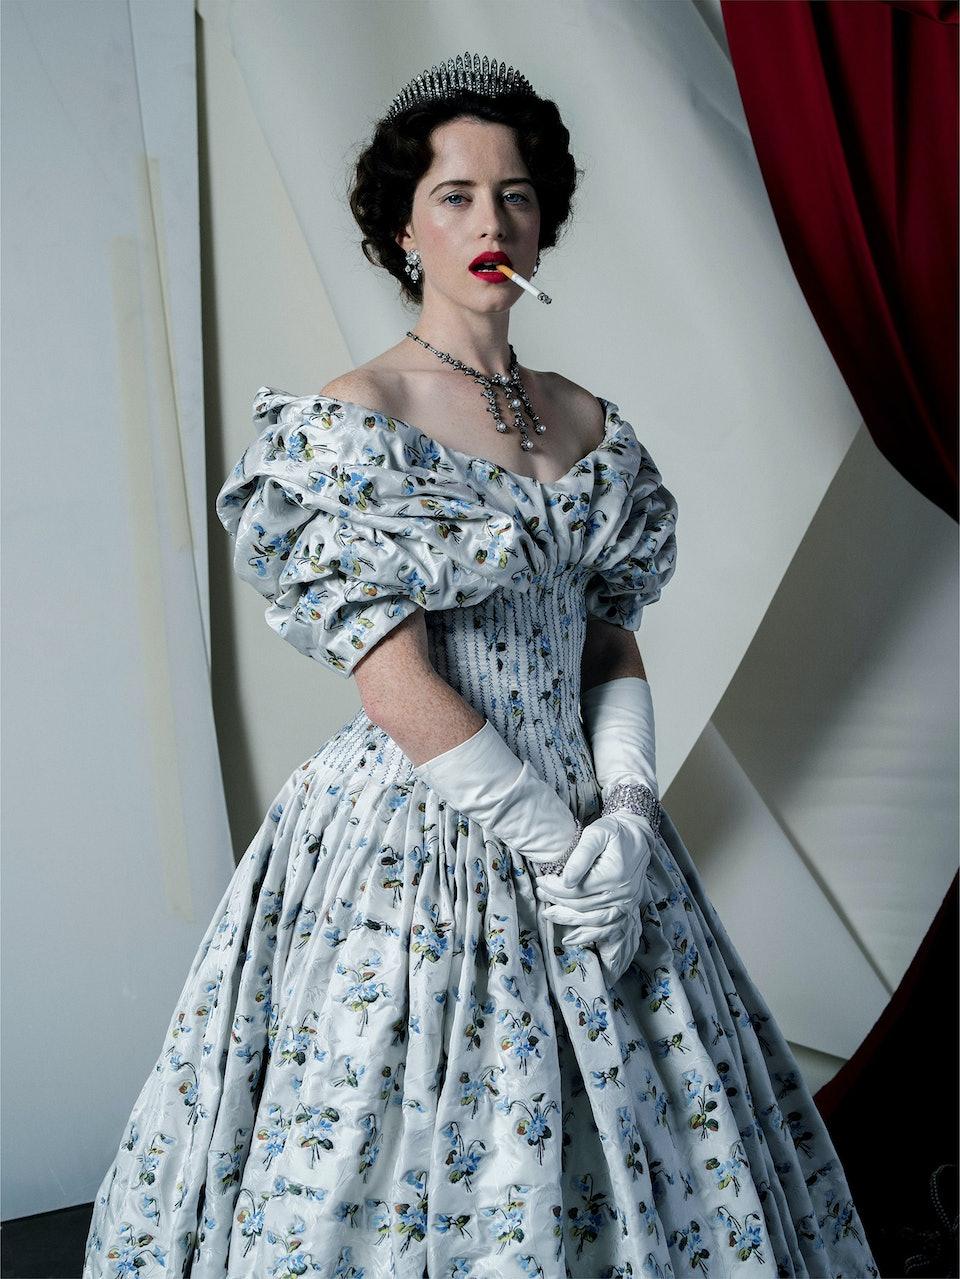 Claire Foy, Fashion- Alexander McQueen, London, 2017 © Tim Walker Studio, Courtesy Michael Hoppen Gallery